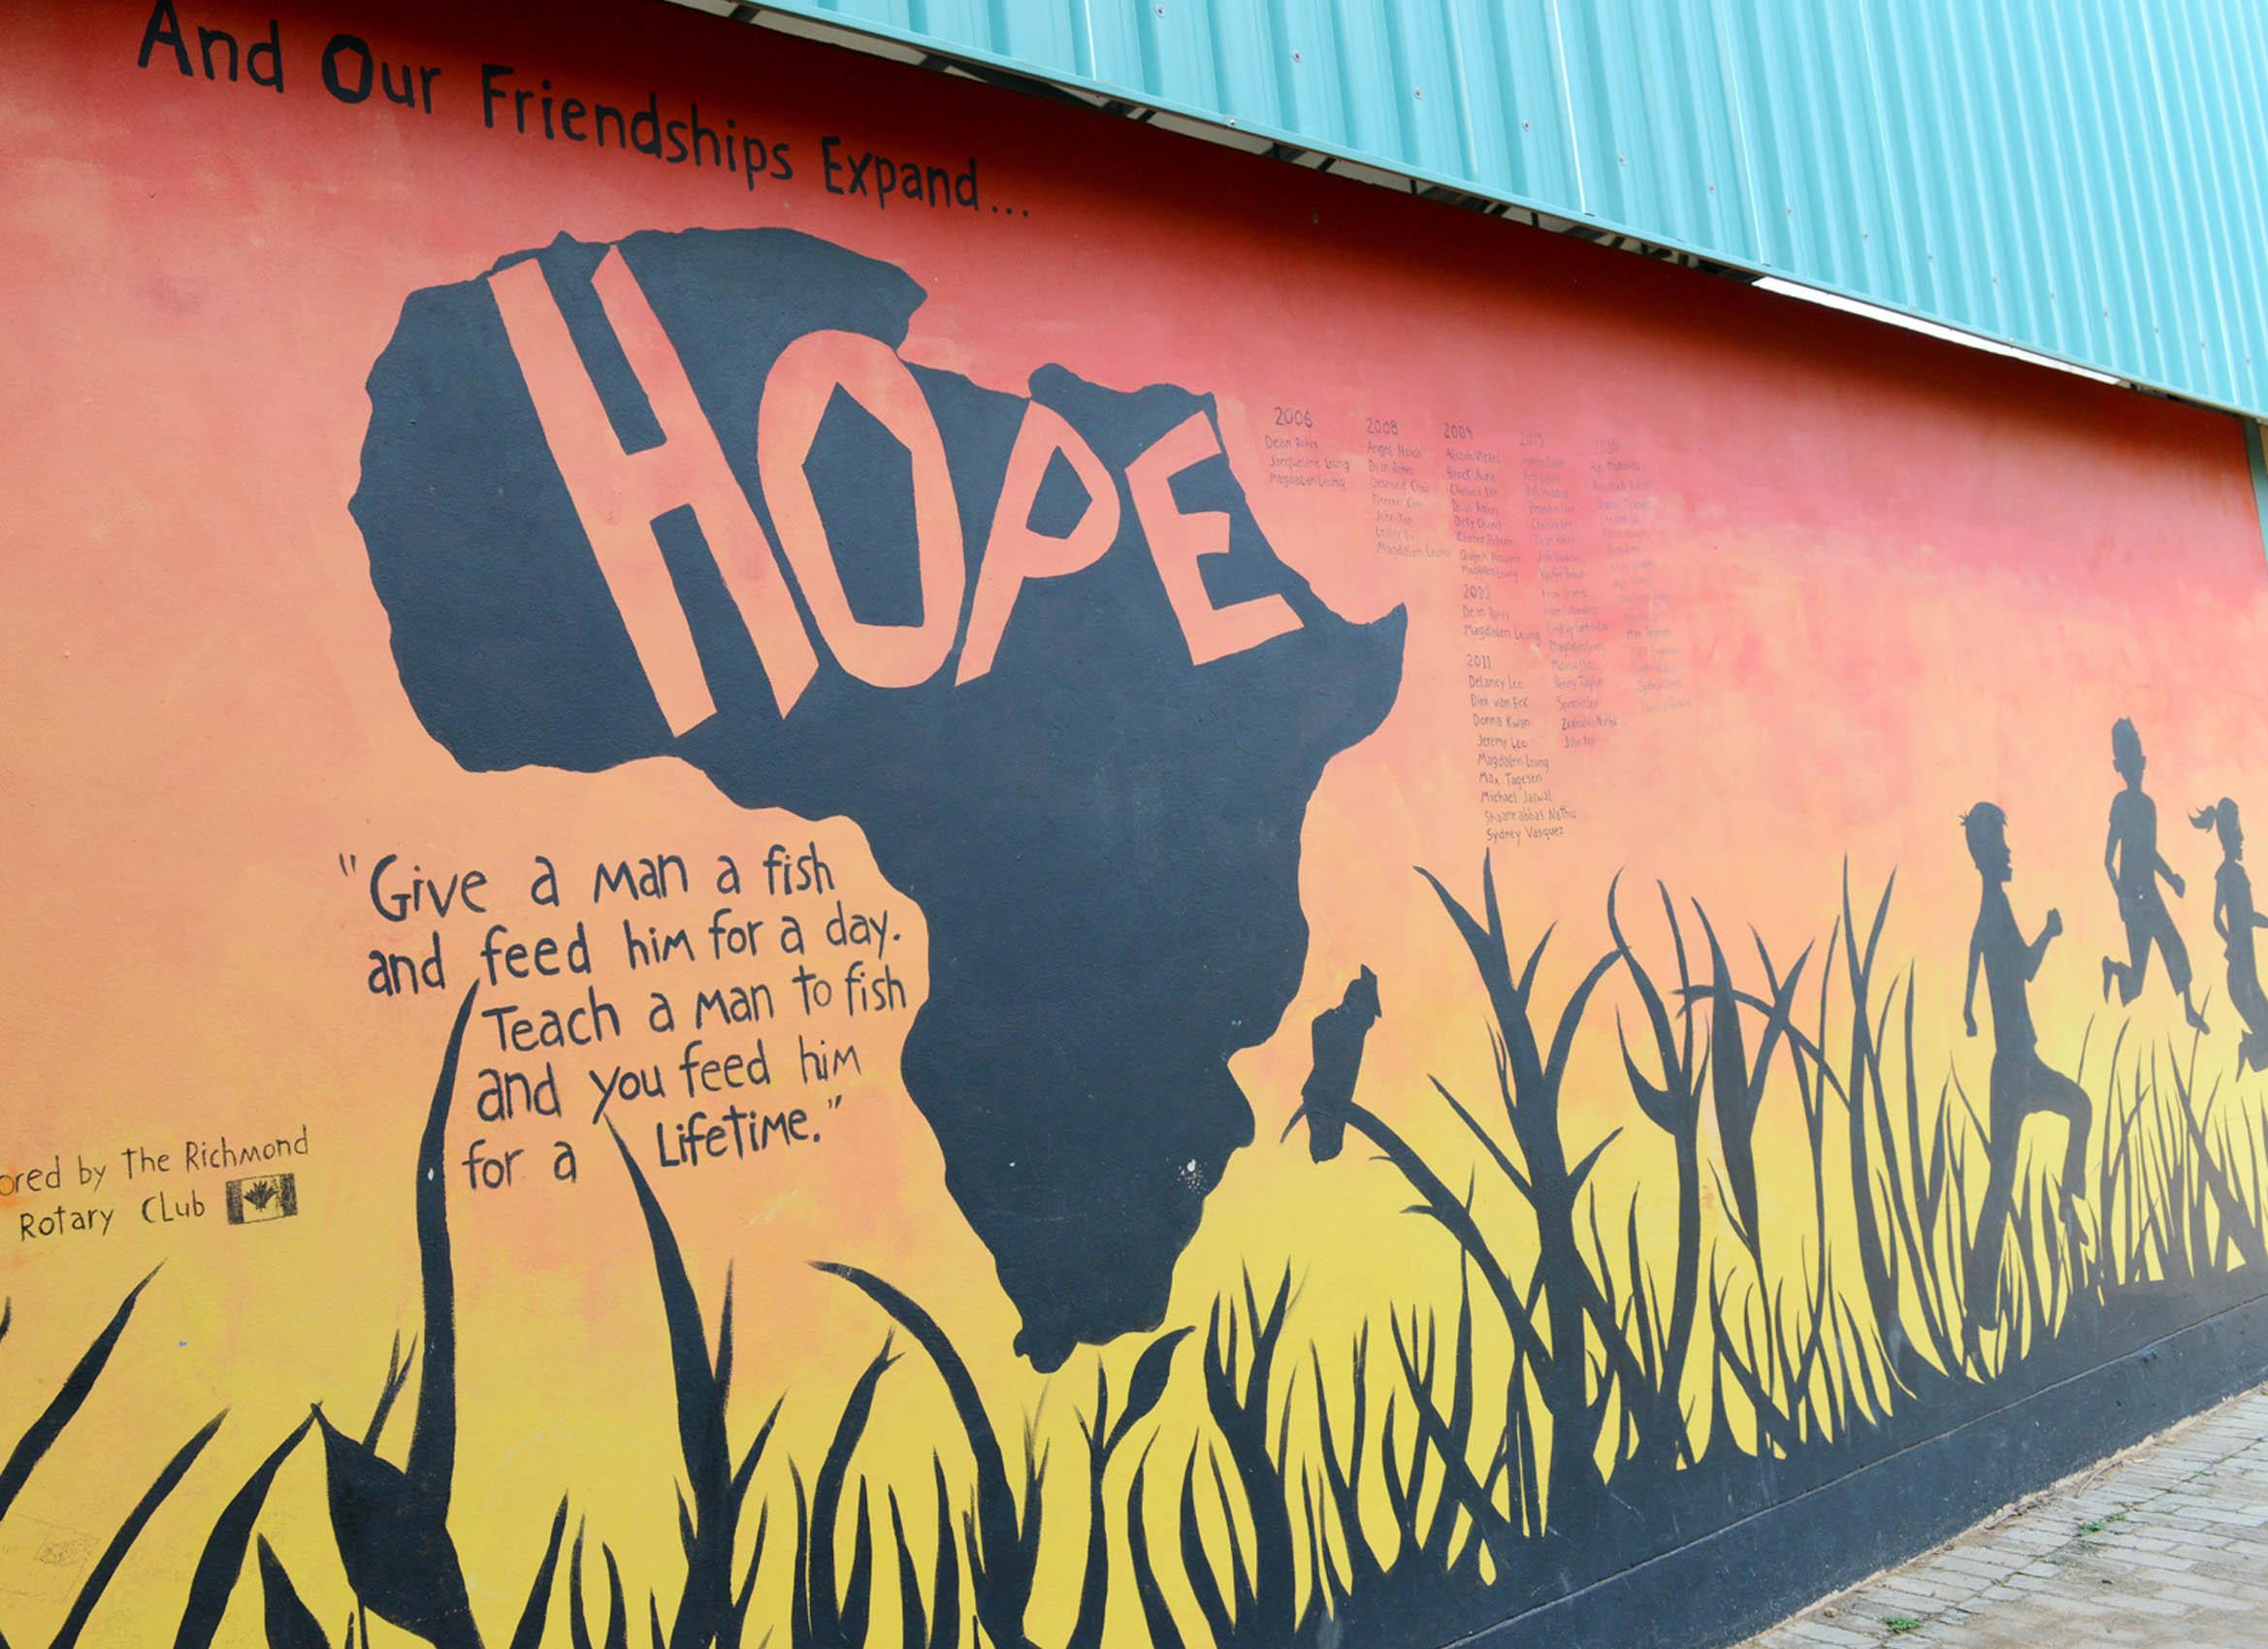 Journeys - Hope